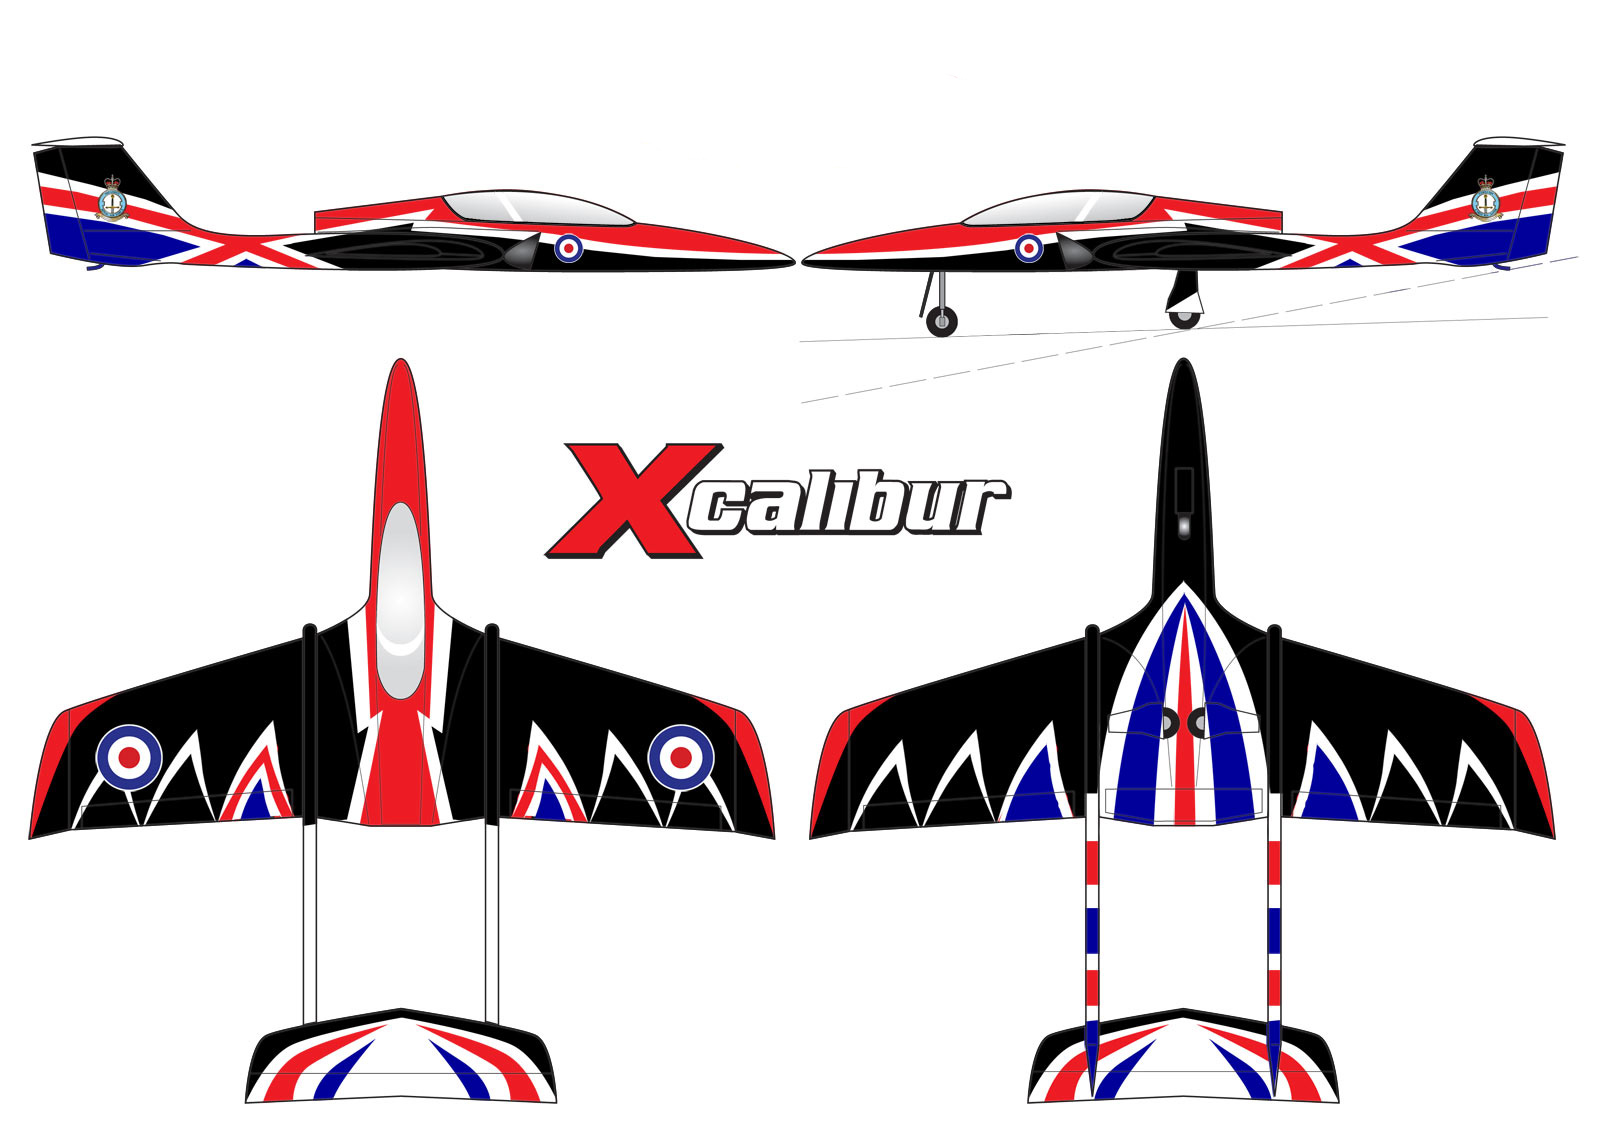 Jsm Xcalibur Large Sports Jet Raf Scheme 163 1 679 99